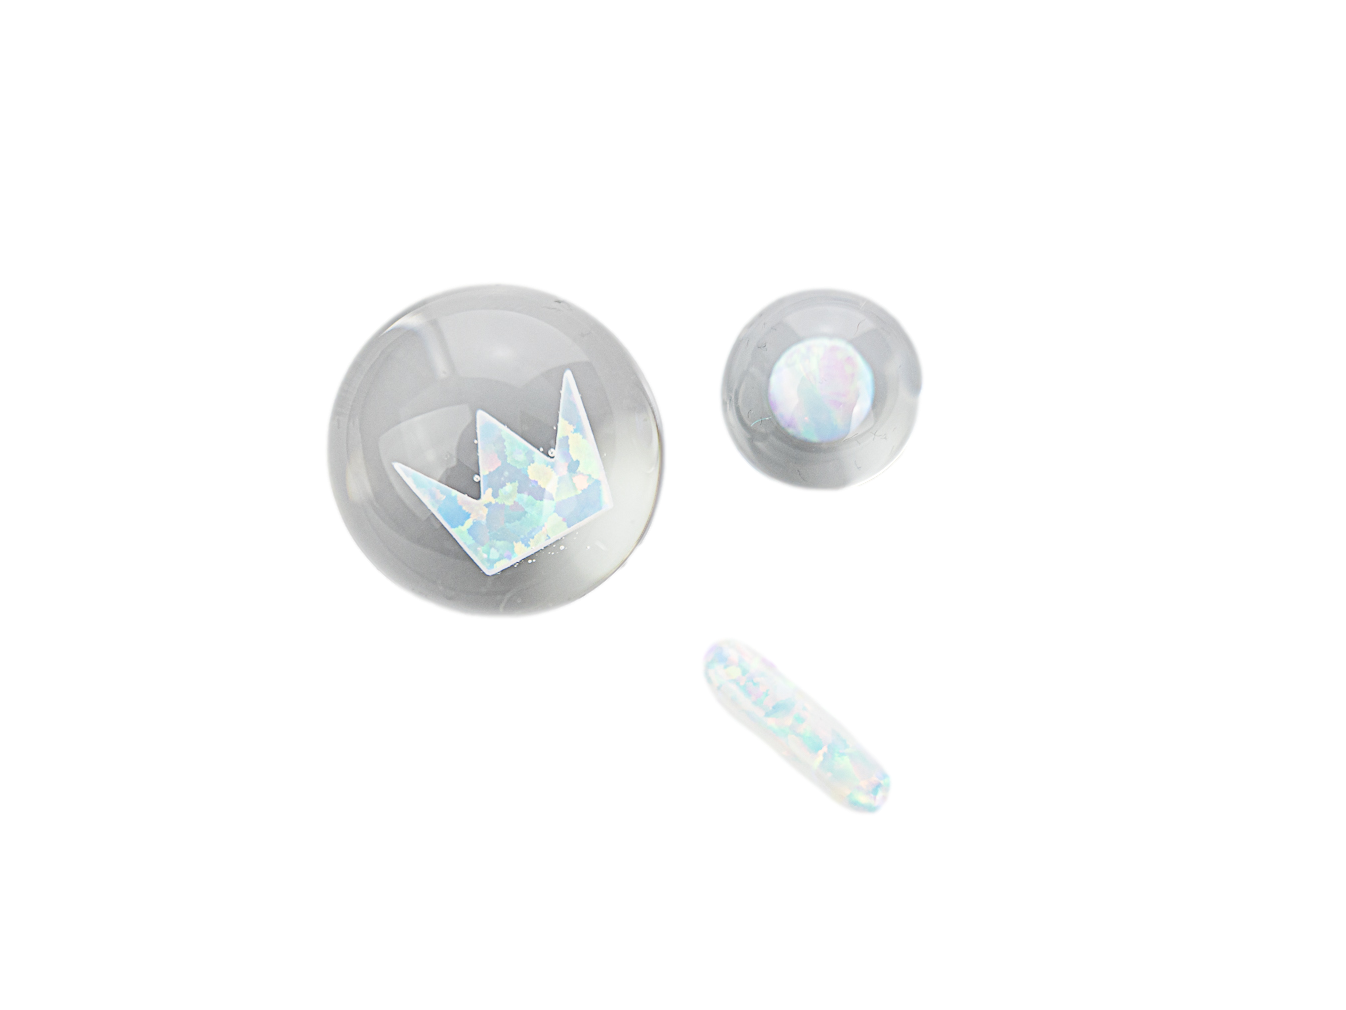 Smir Glass x West Coast Cure Opal Slurper Set